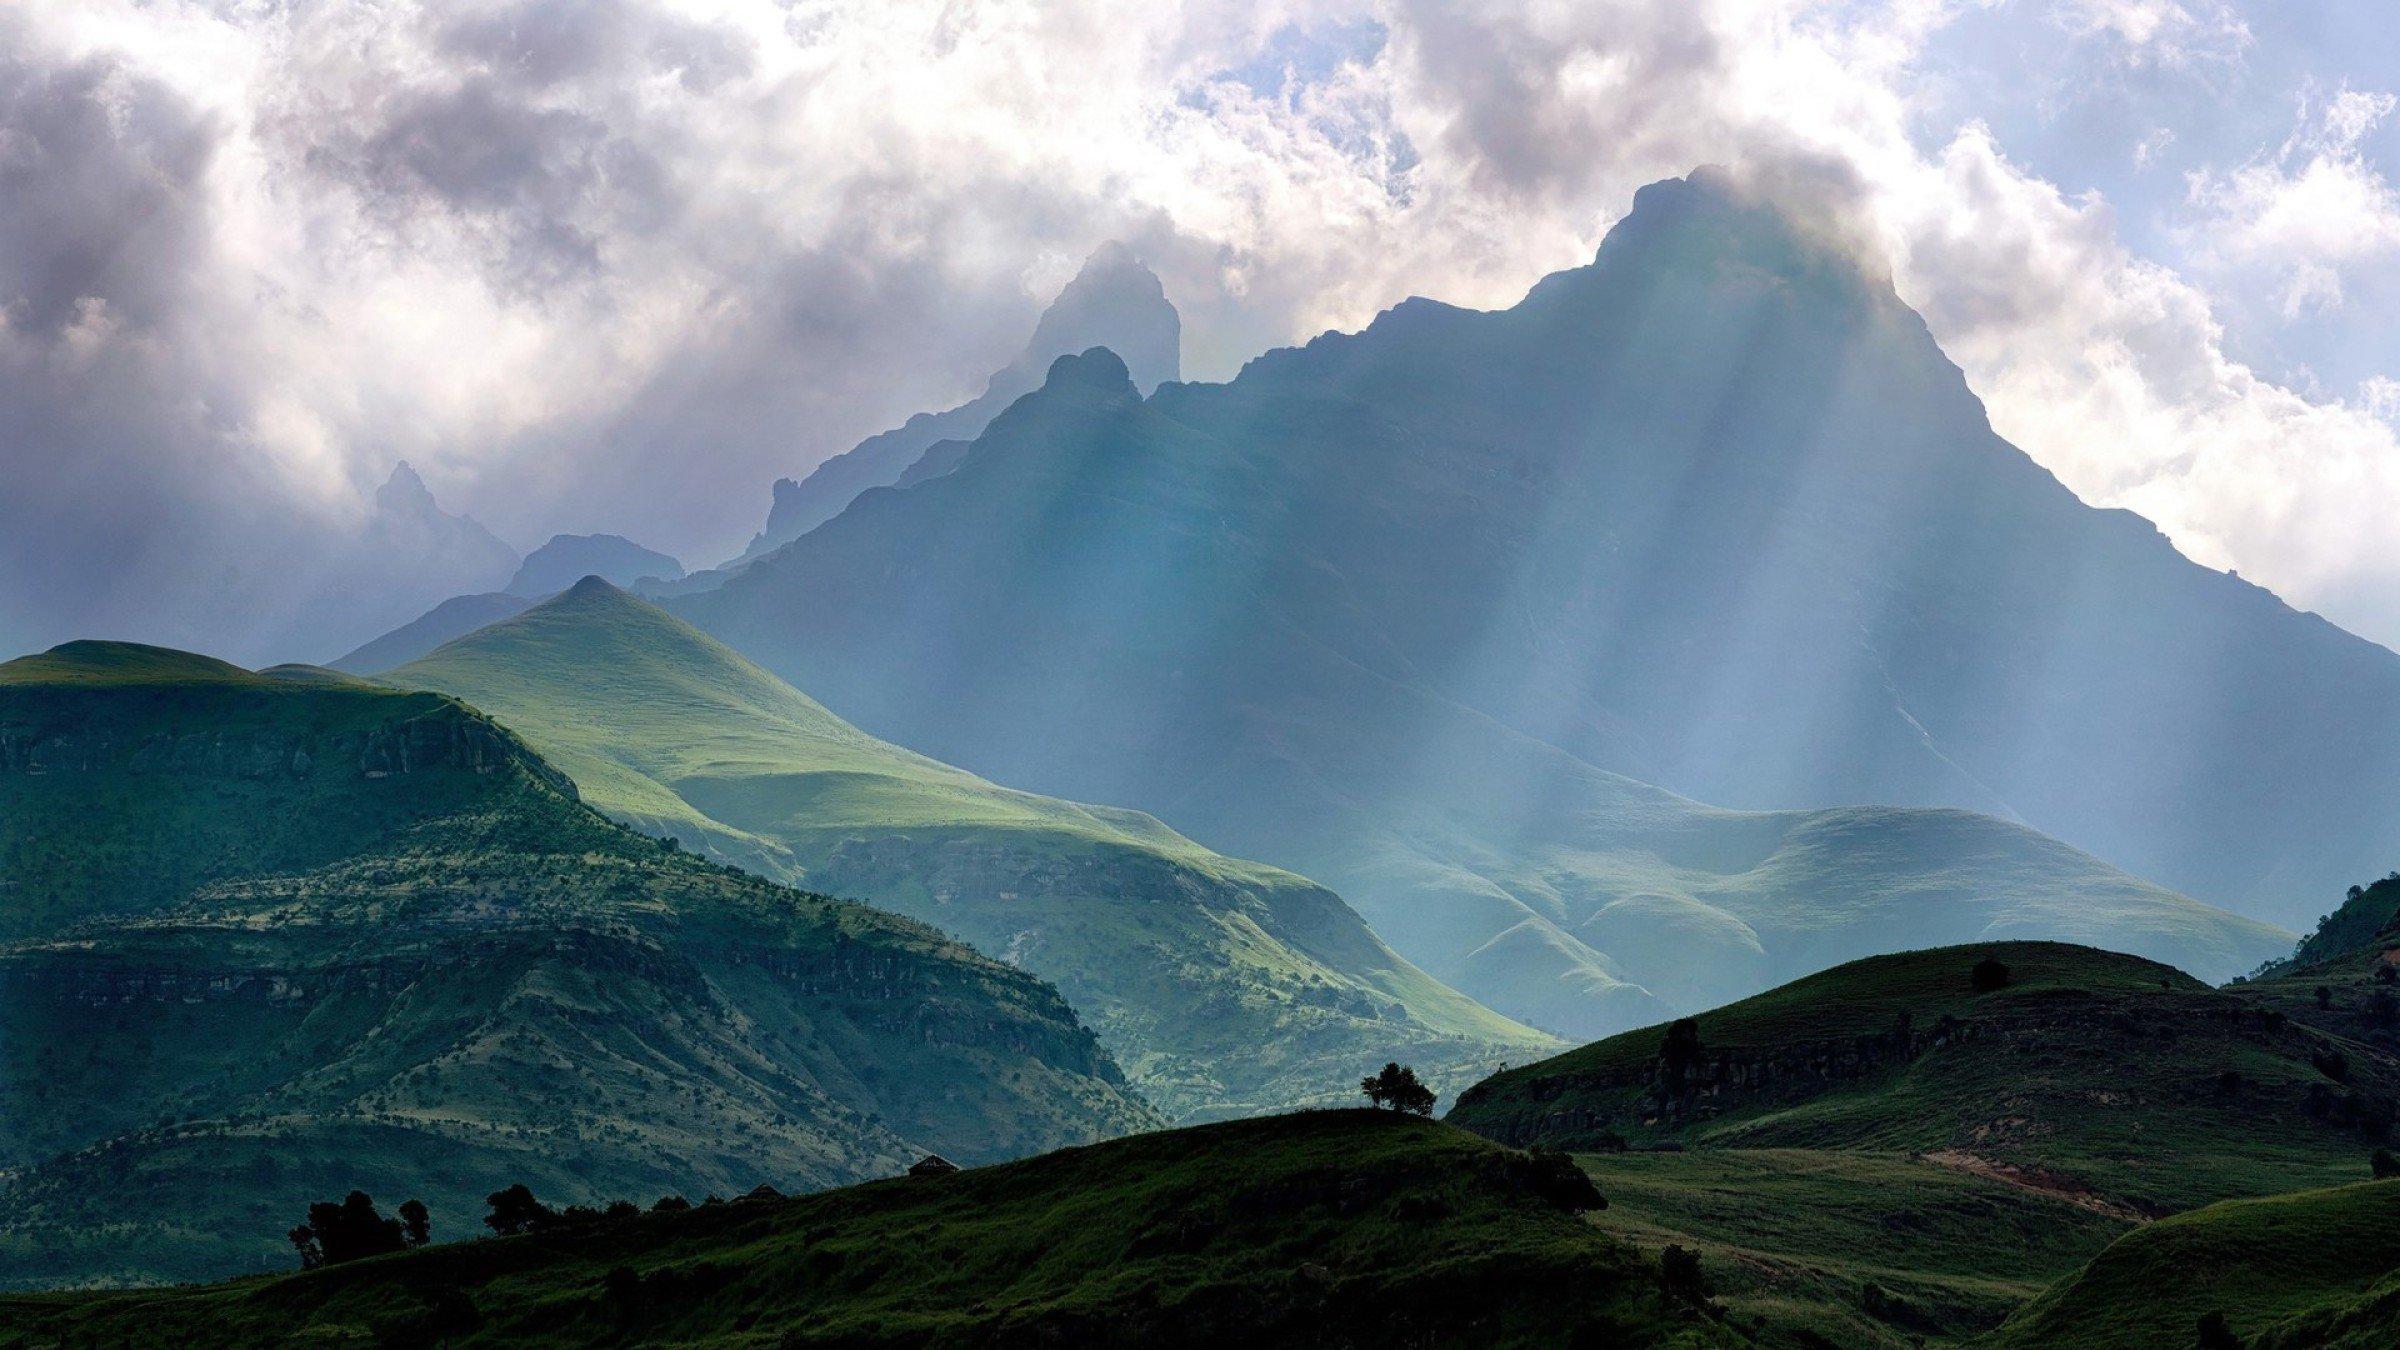 wallpaper landscape mountain sky clouds - photo #36